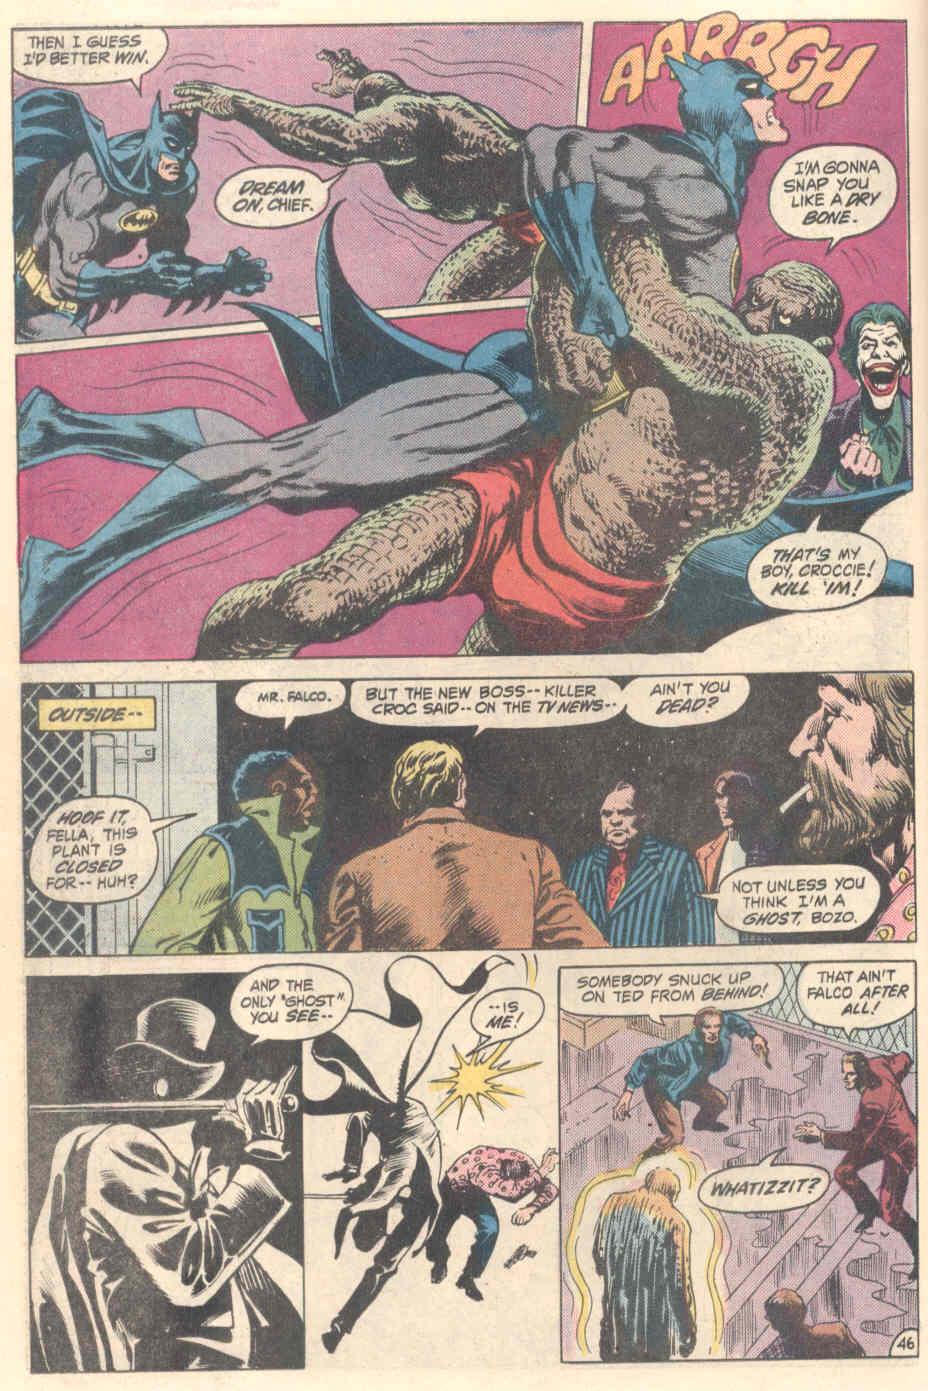 Detective Comics (1937) 526 Page 46